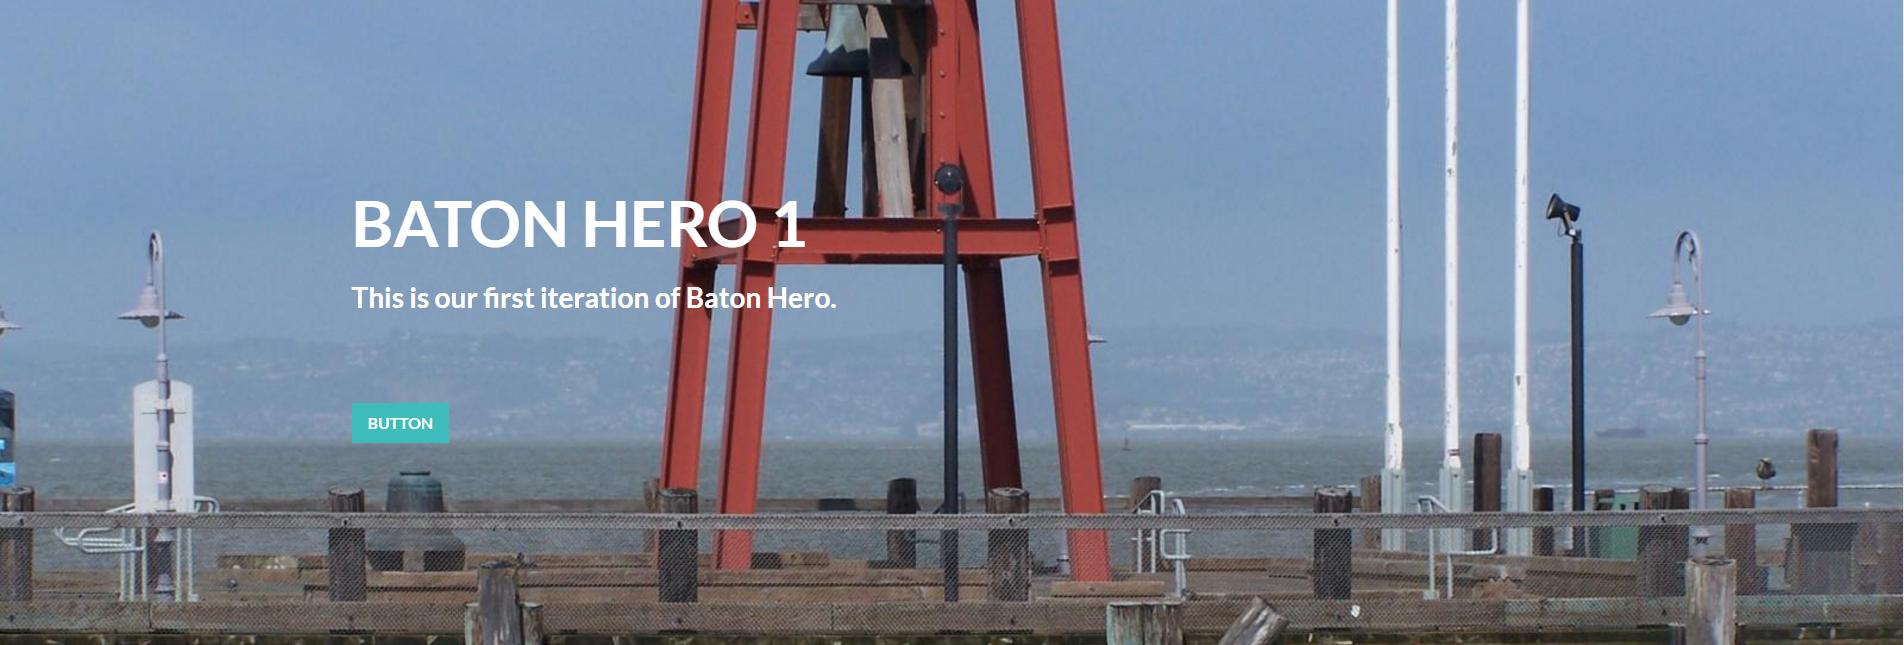 baton-hero-1-example